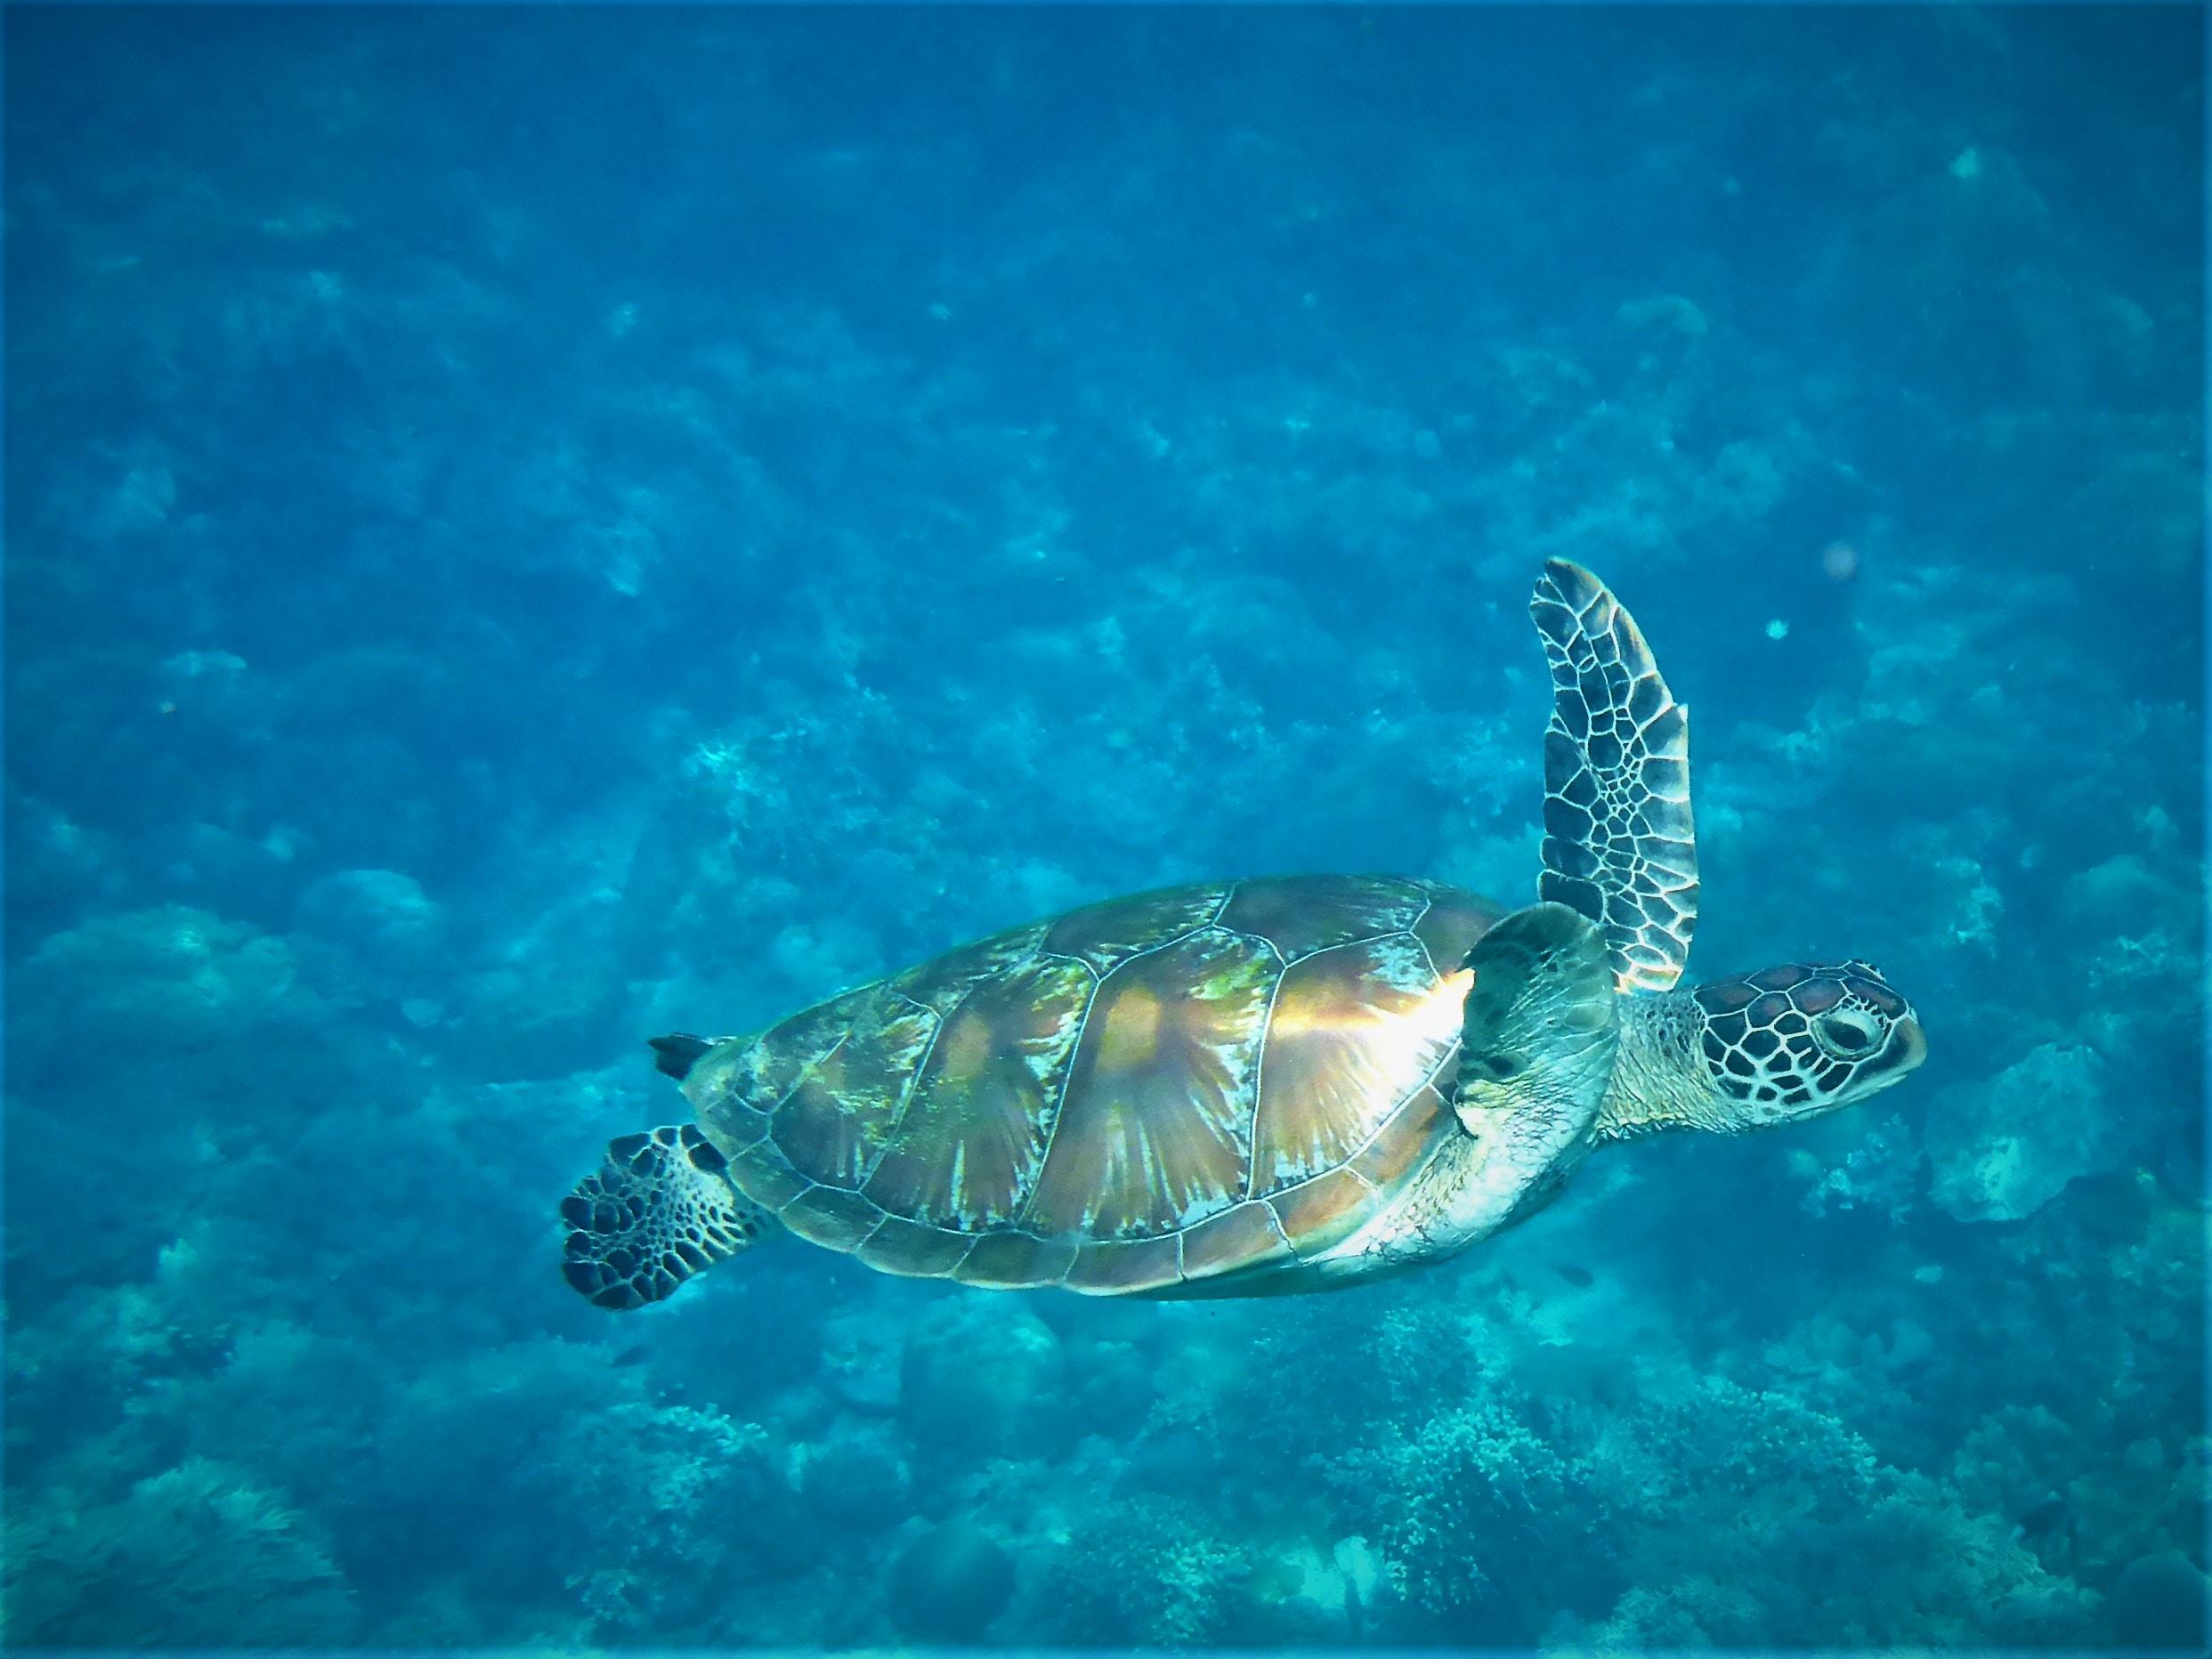 tortoise of water